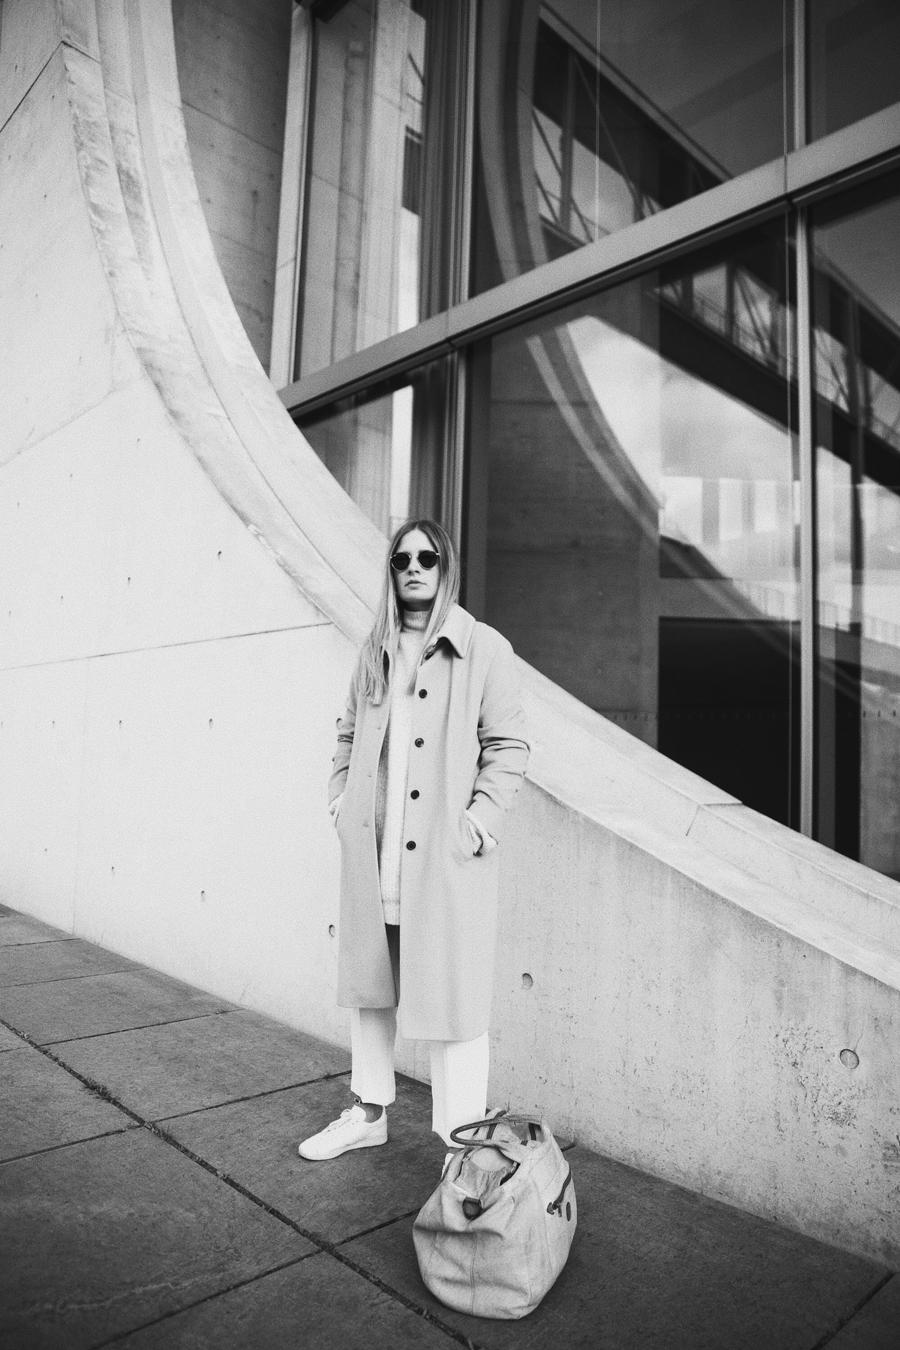 streetstyle-fashionblogger-camel-coat-romina-mey-architecture-berlin-02